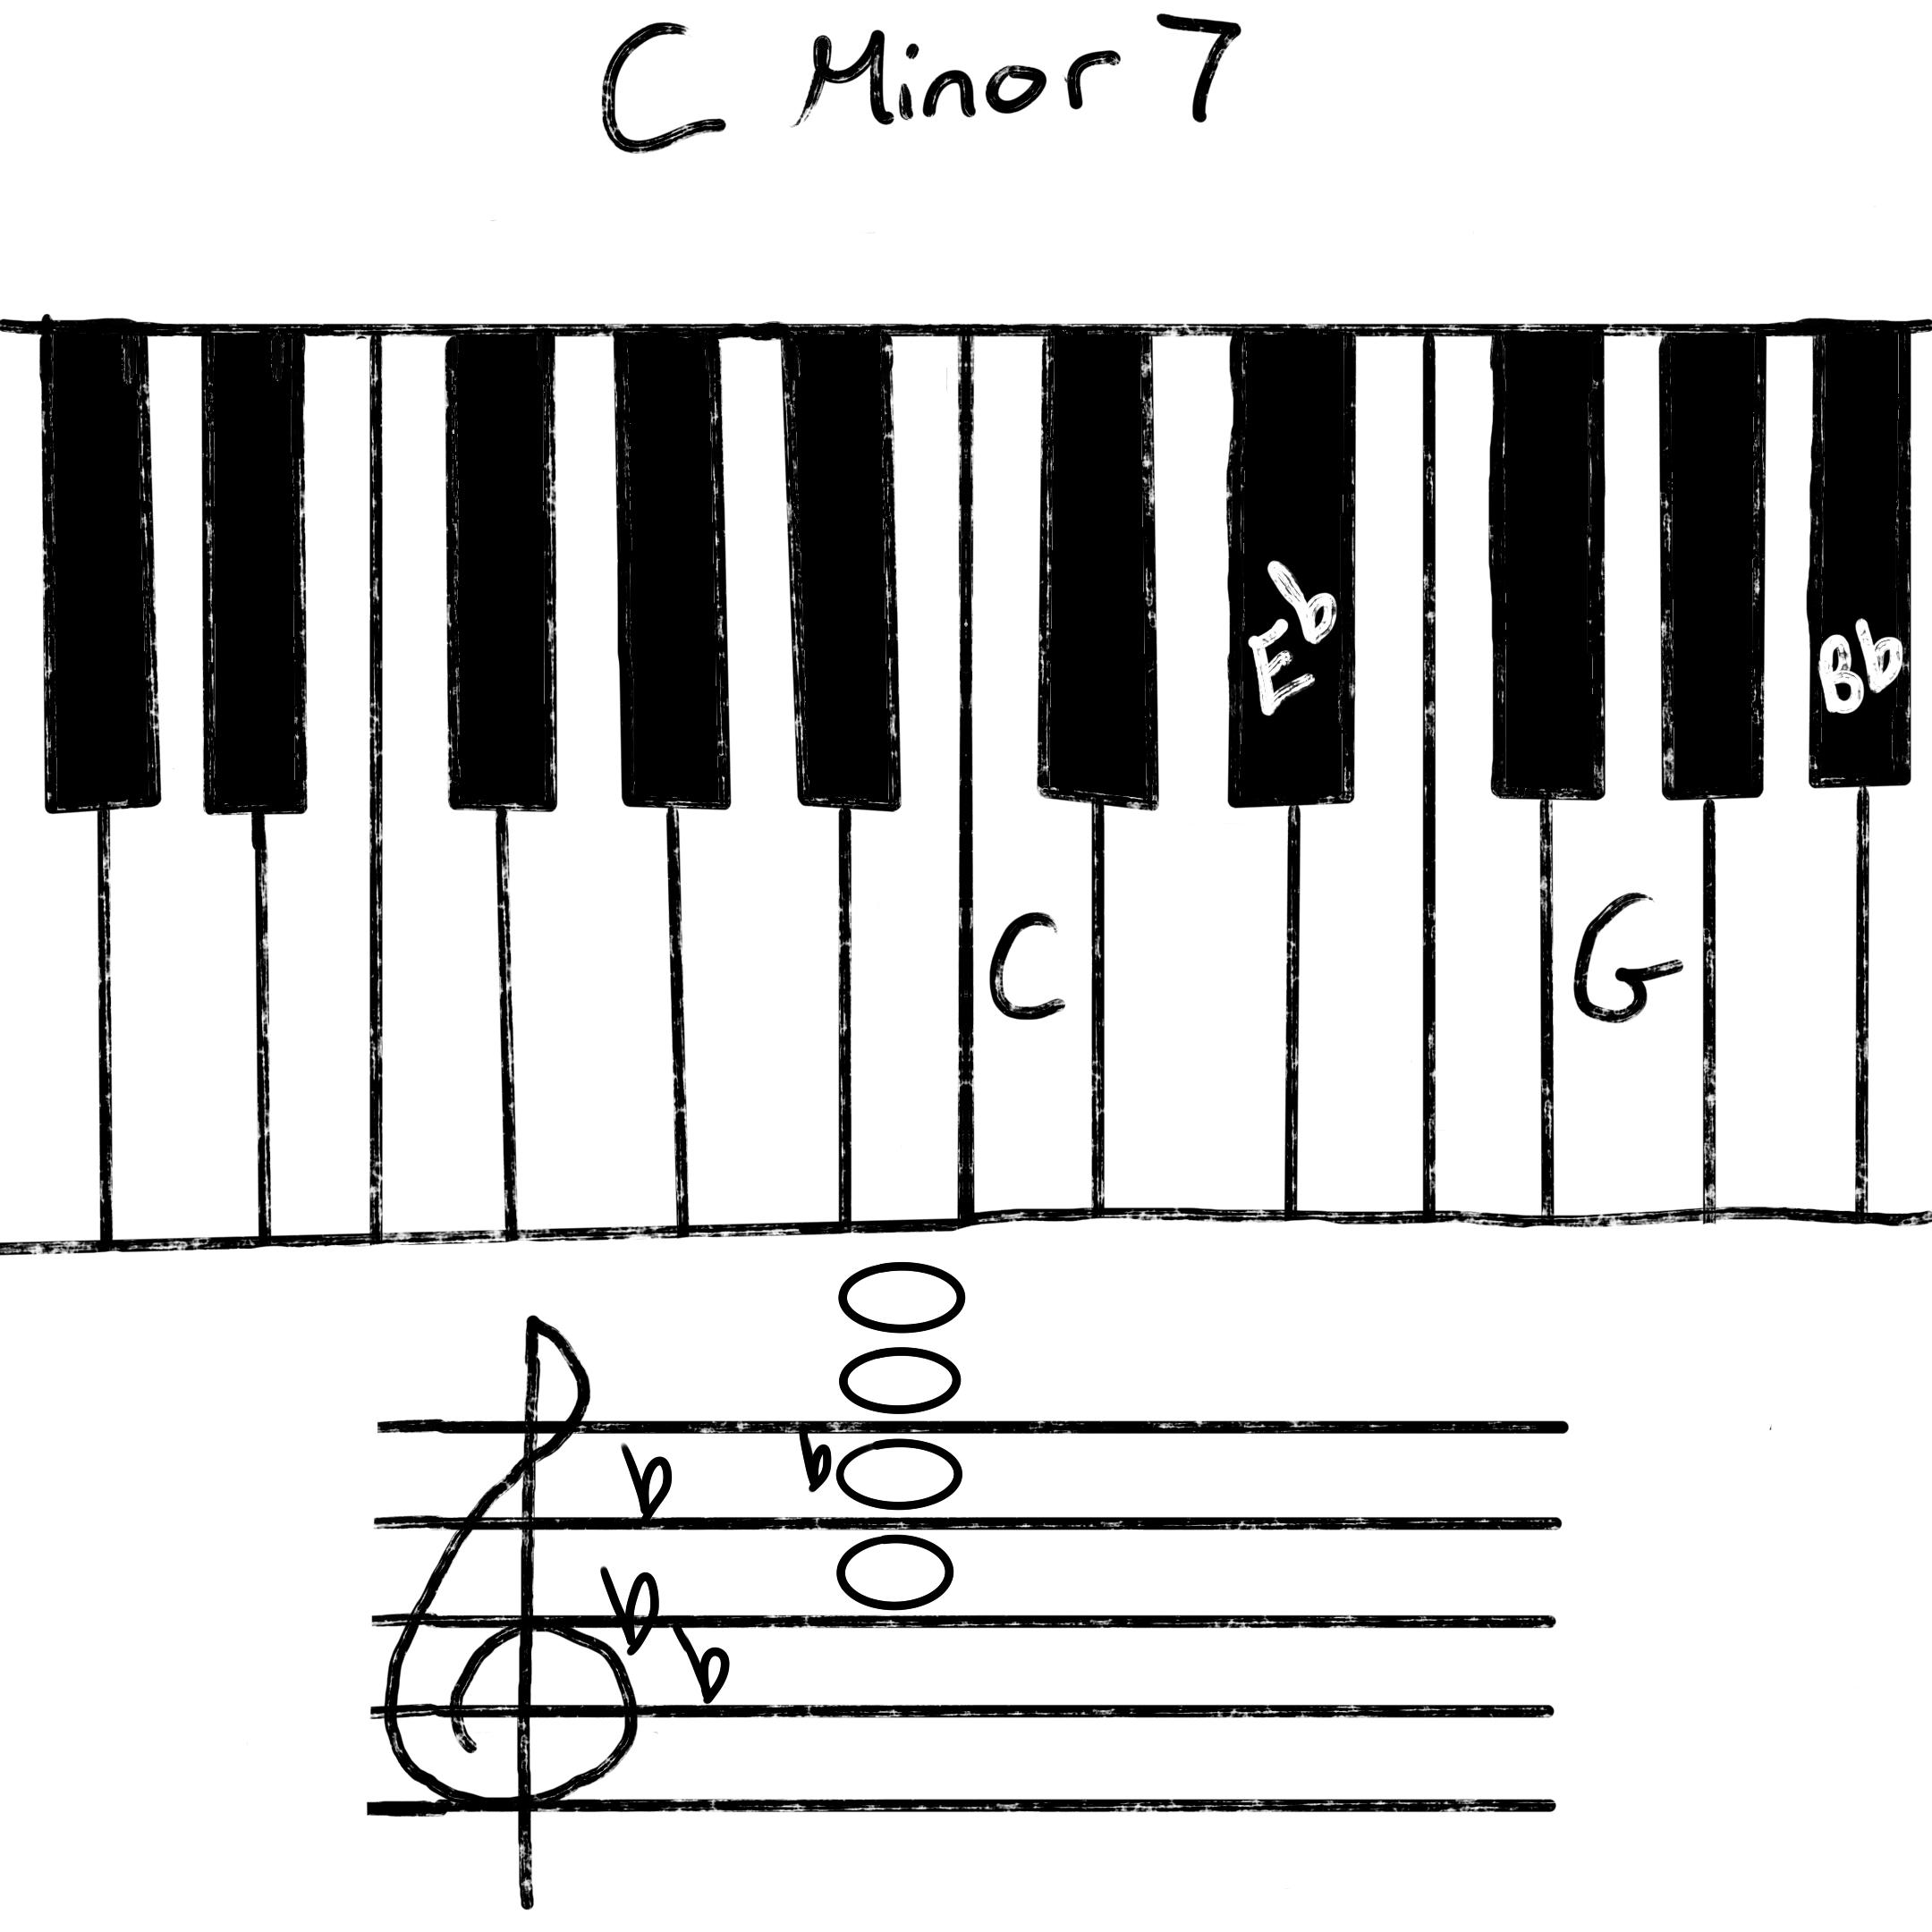 Cm7 minor 7